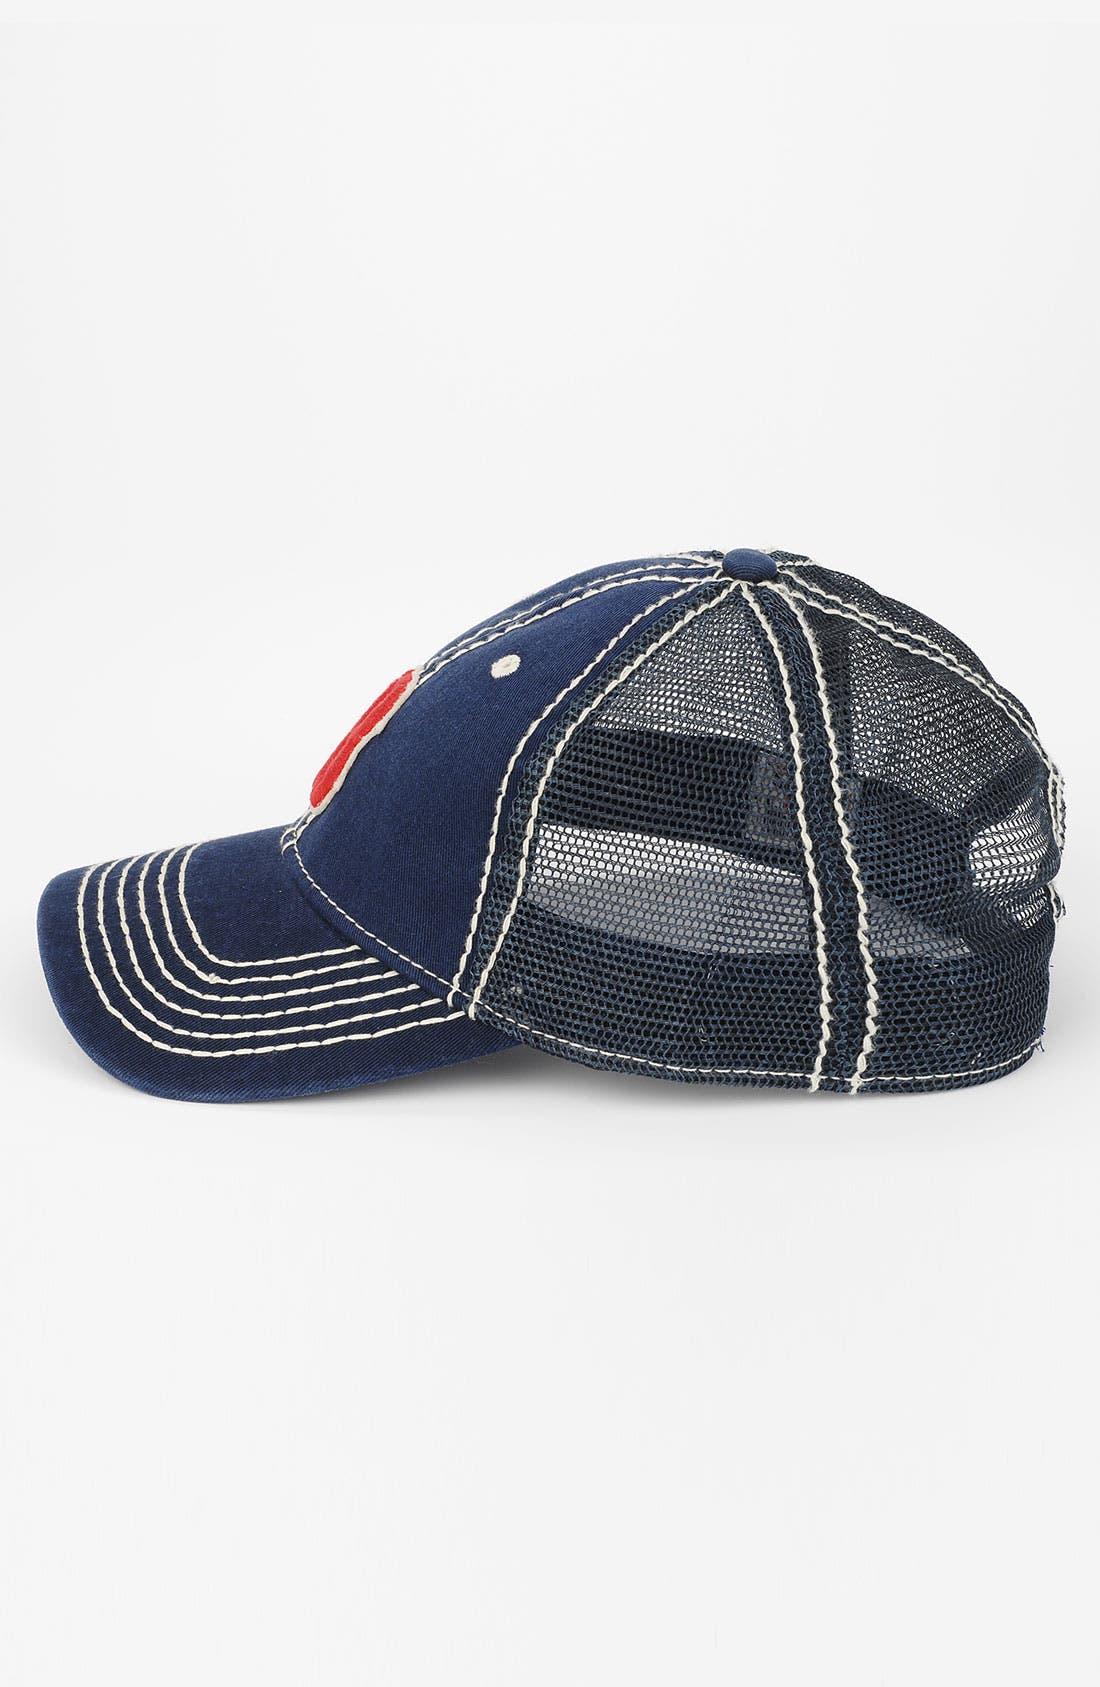 Alternate Image 2  - American Needle 'Red Sox' Mesh Back Baseball Cap